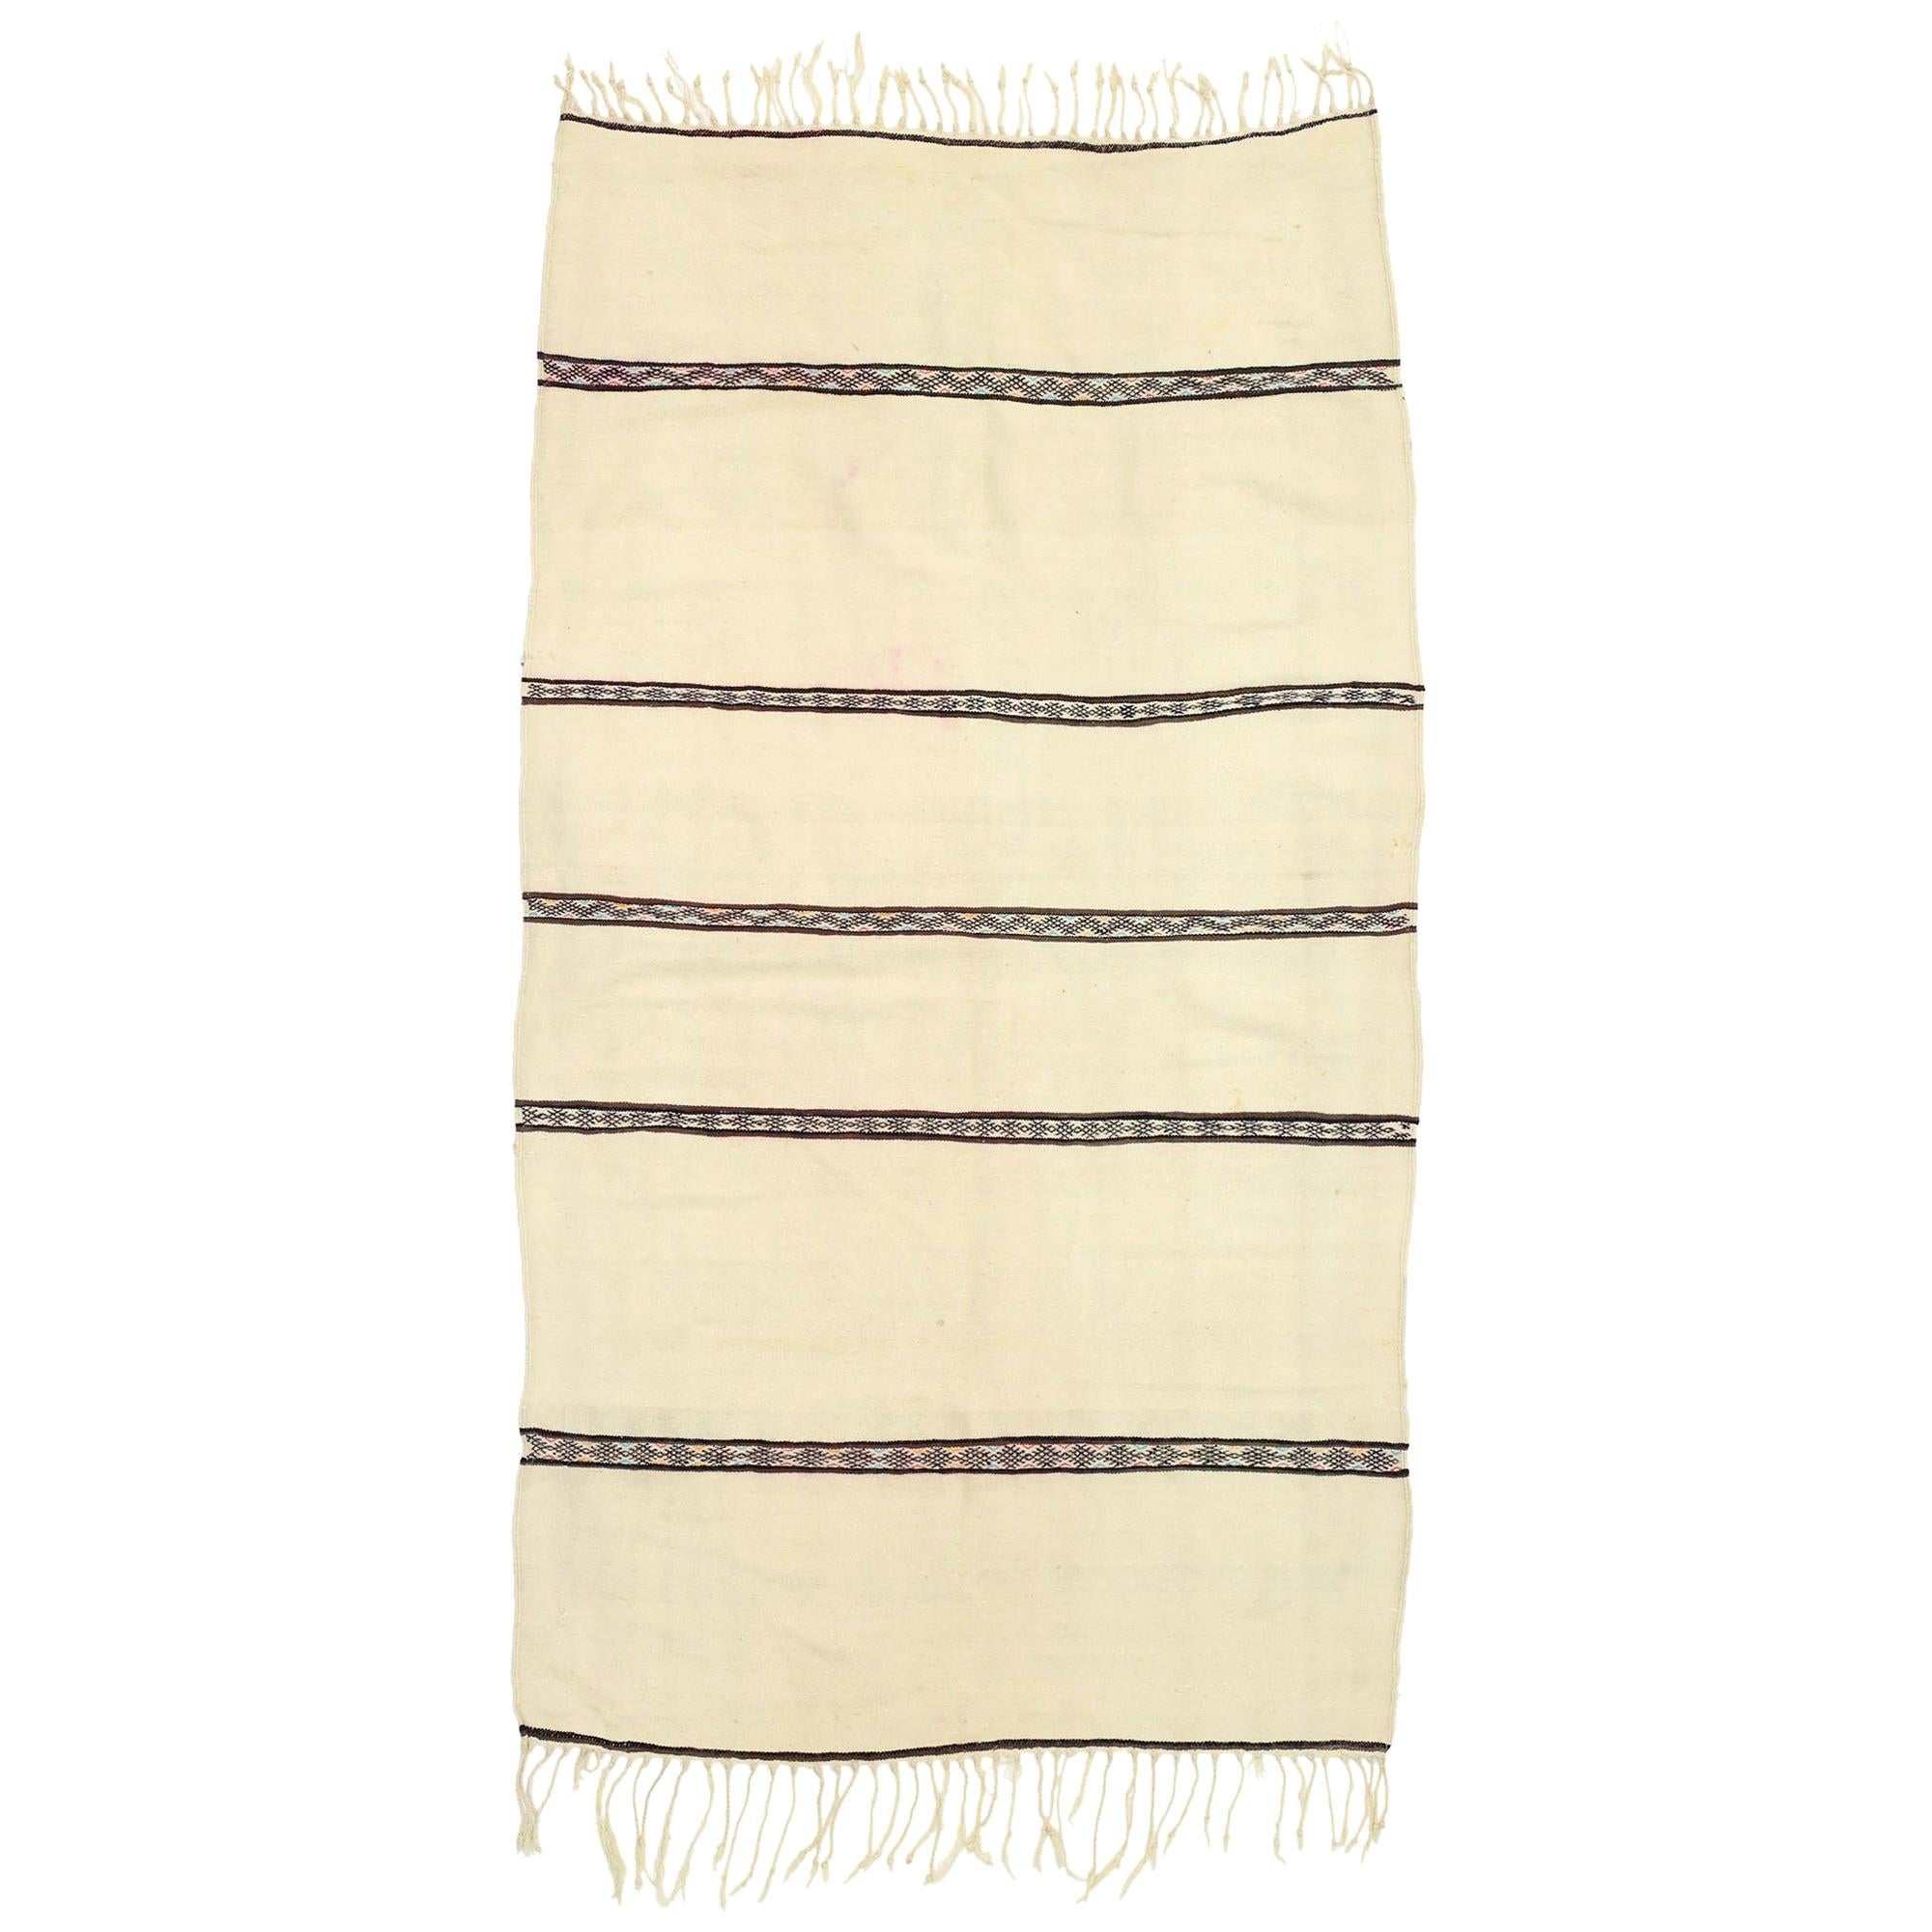 Vintage Berber Moroccan Handira Kilim Rug with Bohemian Tribal Style, Flat-Weave